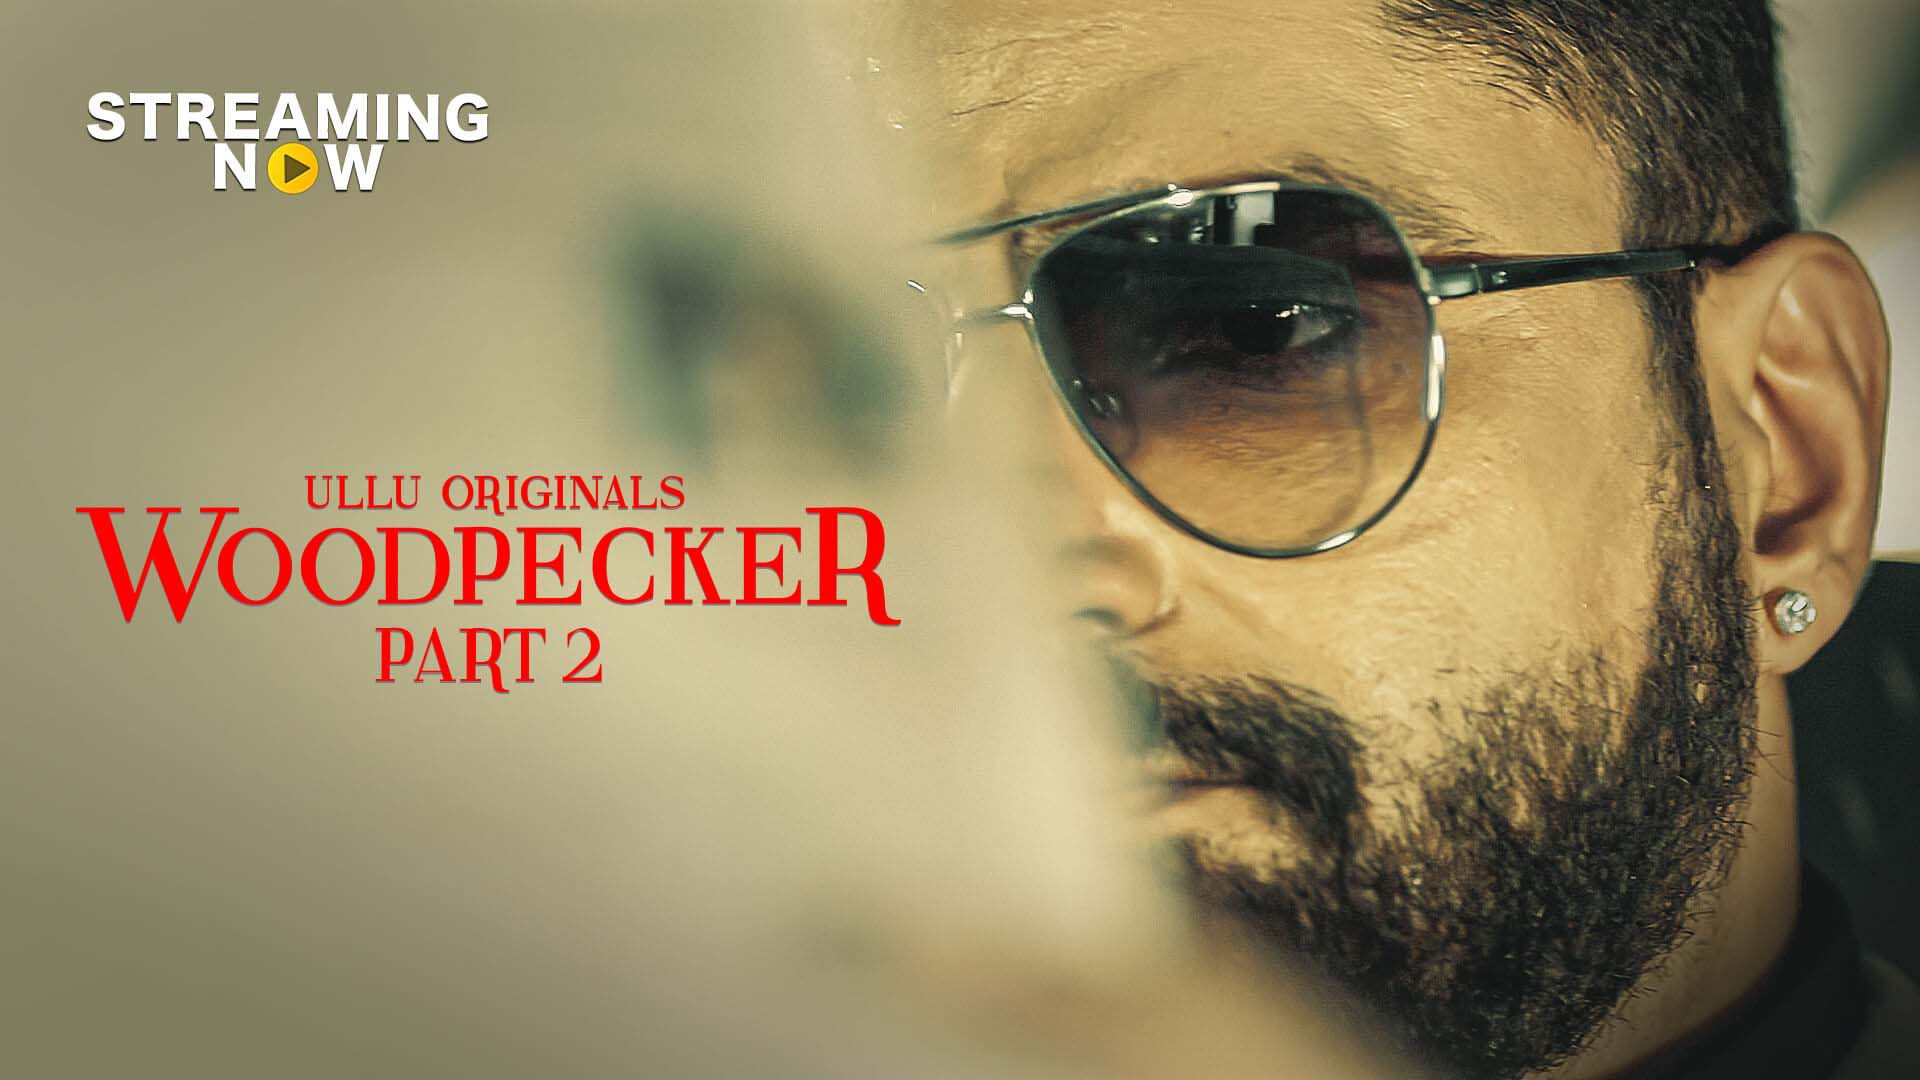 Woodpecker Part 2 2020 S01 Hindi Ullu Complete Web Series 720p HDRip 590MB Download